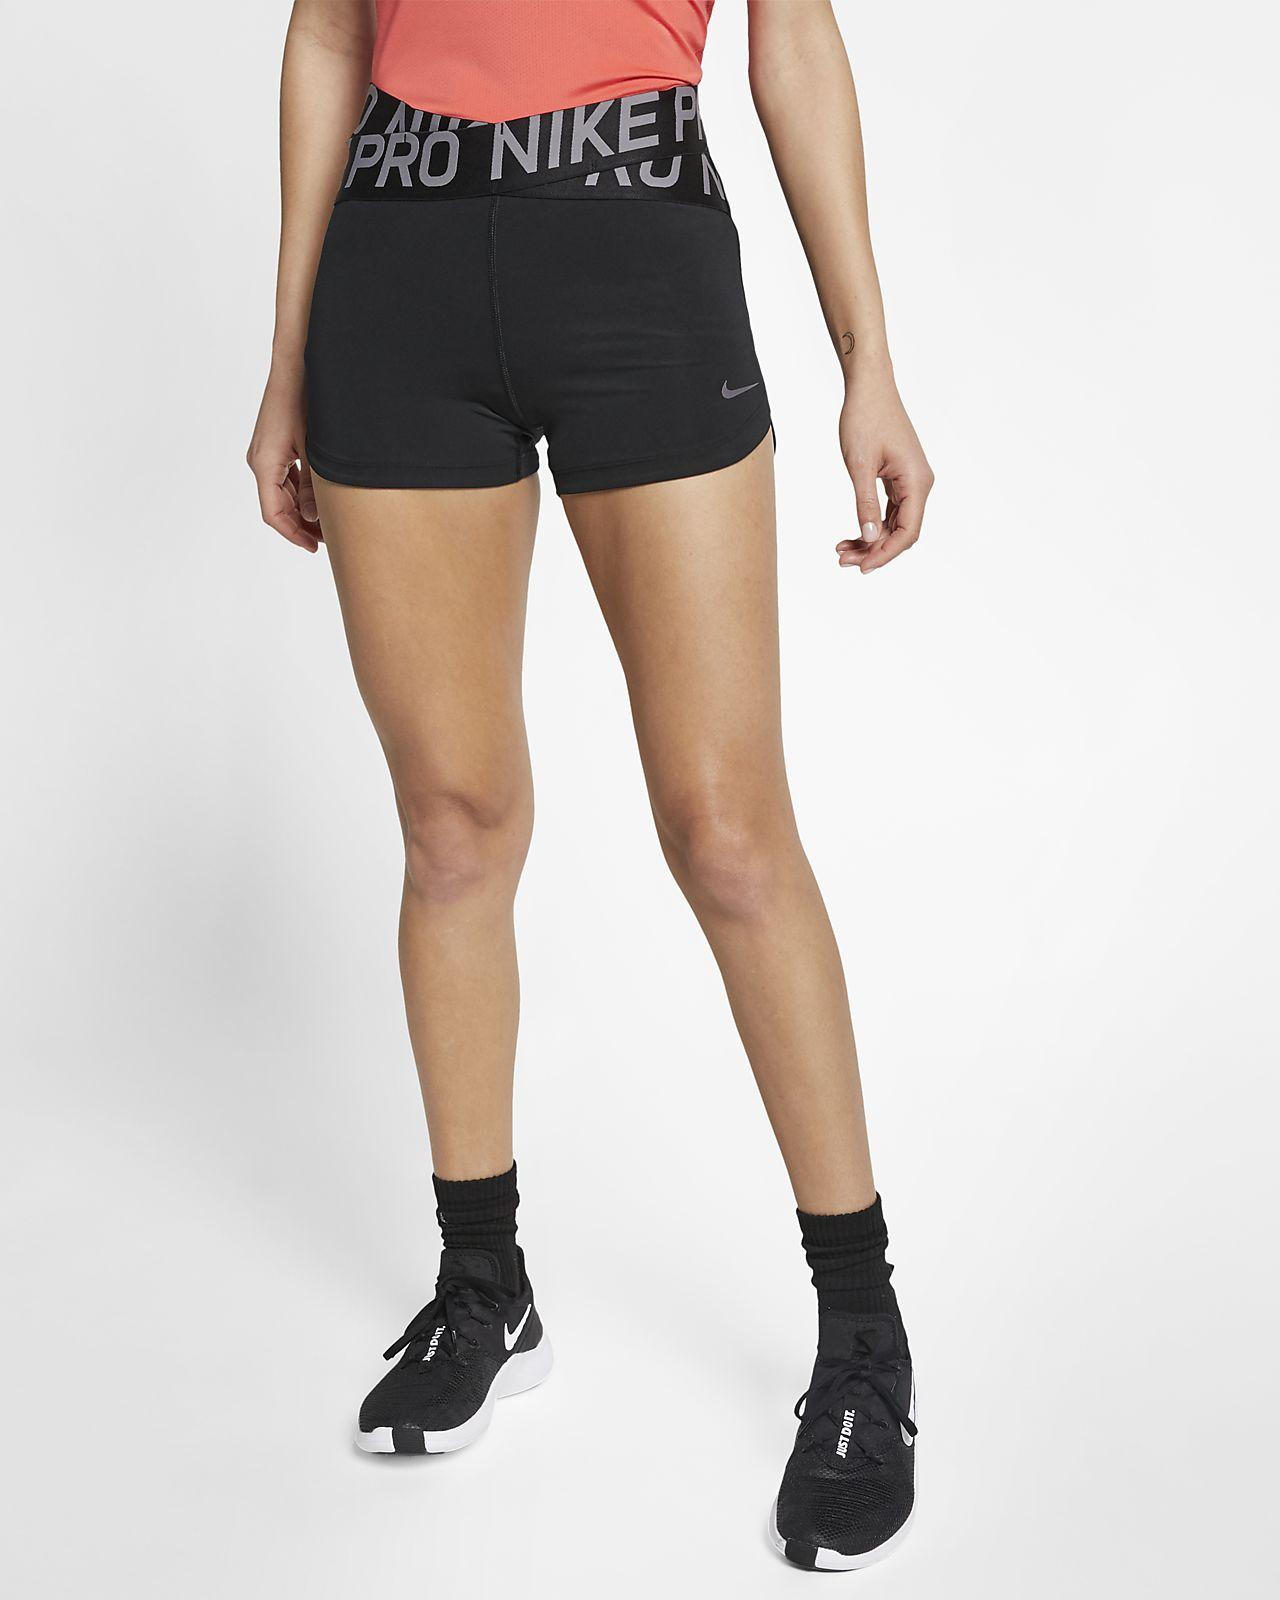 7190c5a7d Nike Pro Intertwist Pantalón corto de 8 cm - Mujer